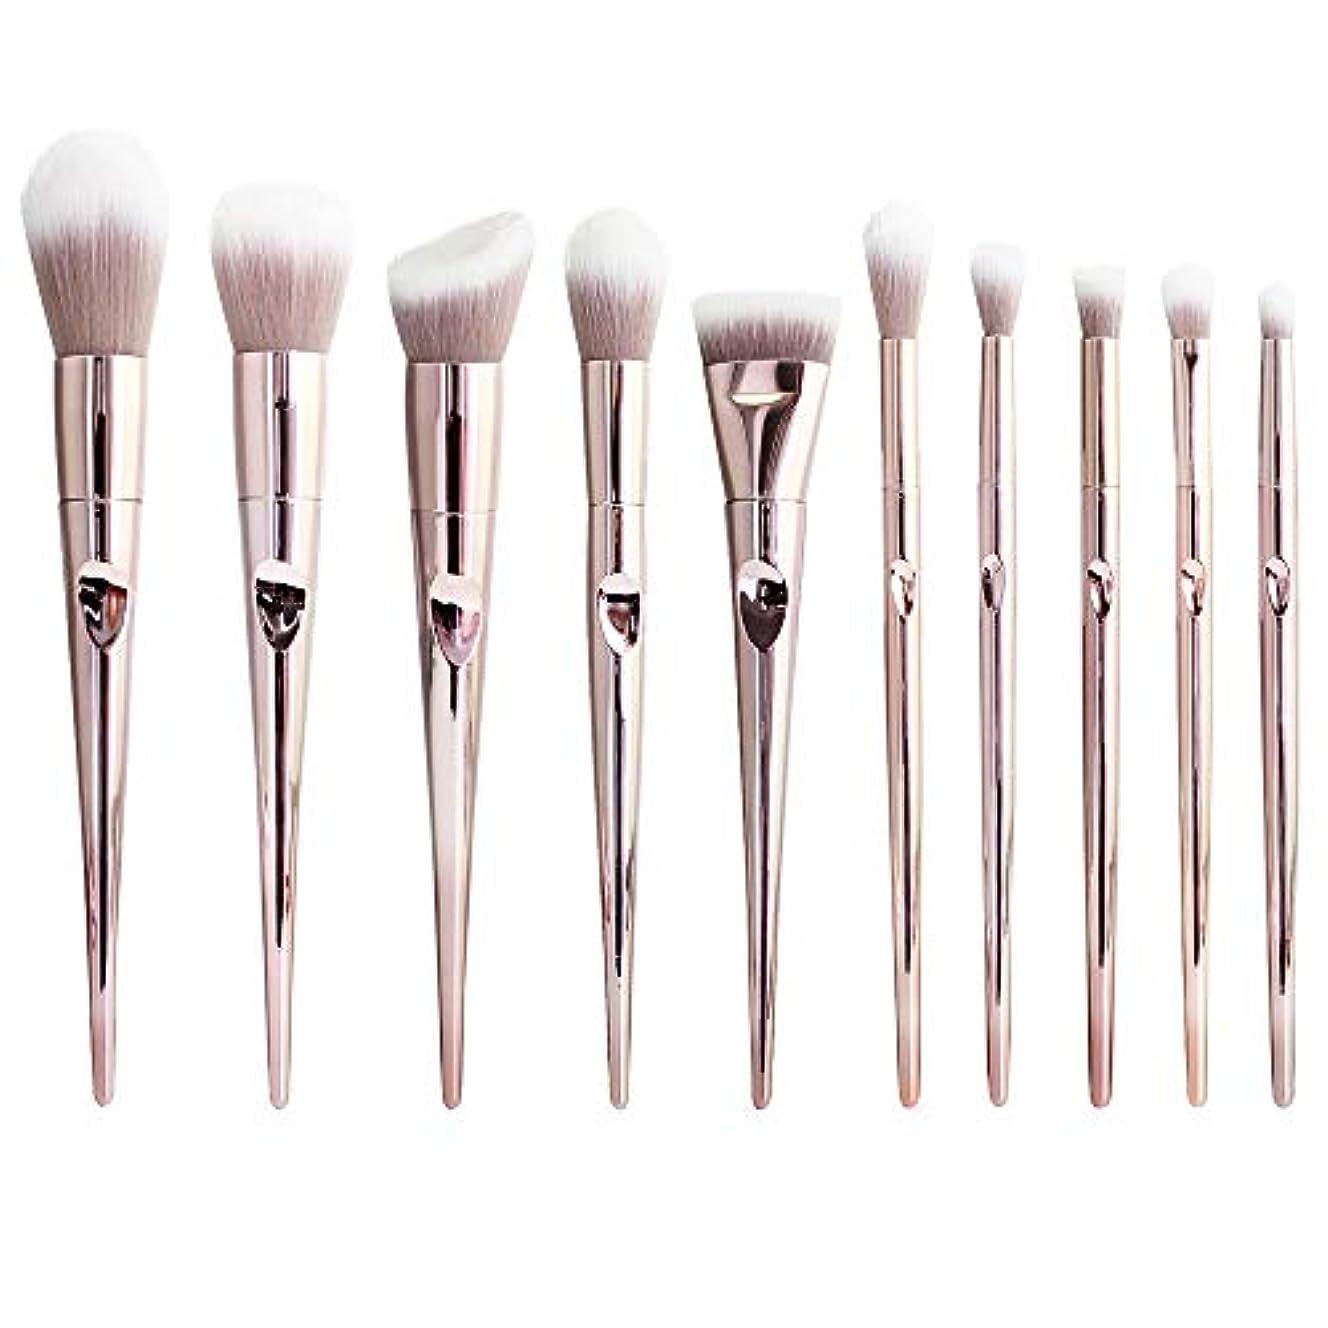 SUPER DREAM メイクブラシ 10セット 化粧ブラシセット 化粧筆 フェイスブラシ 全顔対応 高級ナイロン毛 超柔らかい メイク道具ブラシ